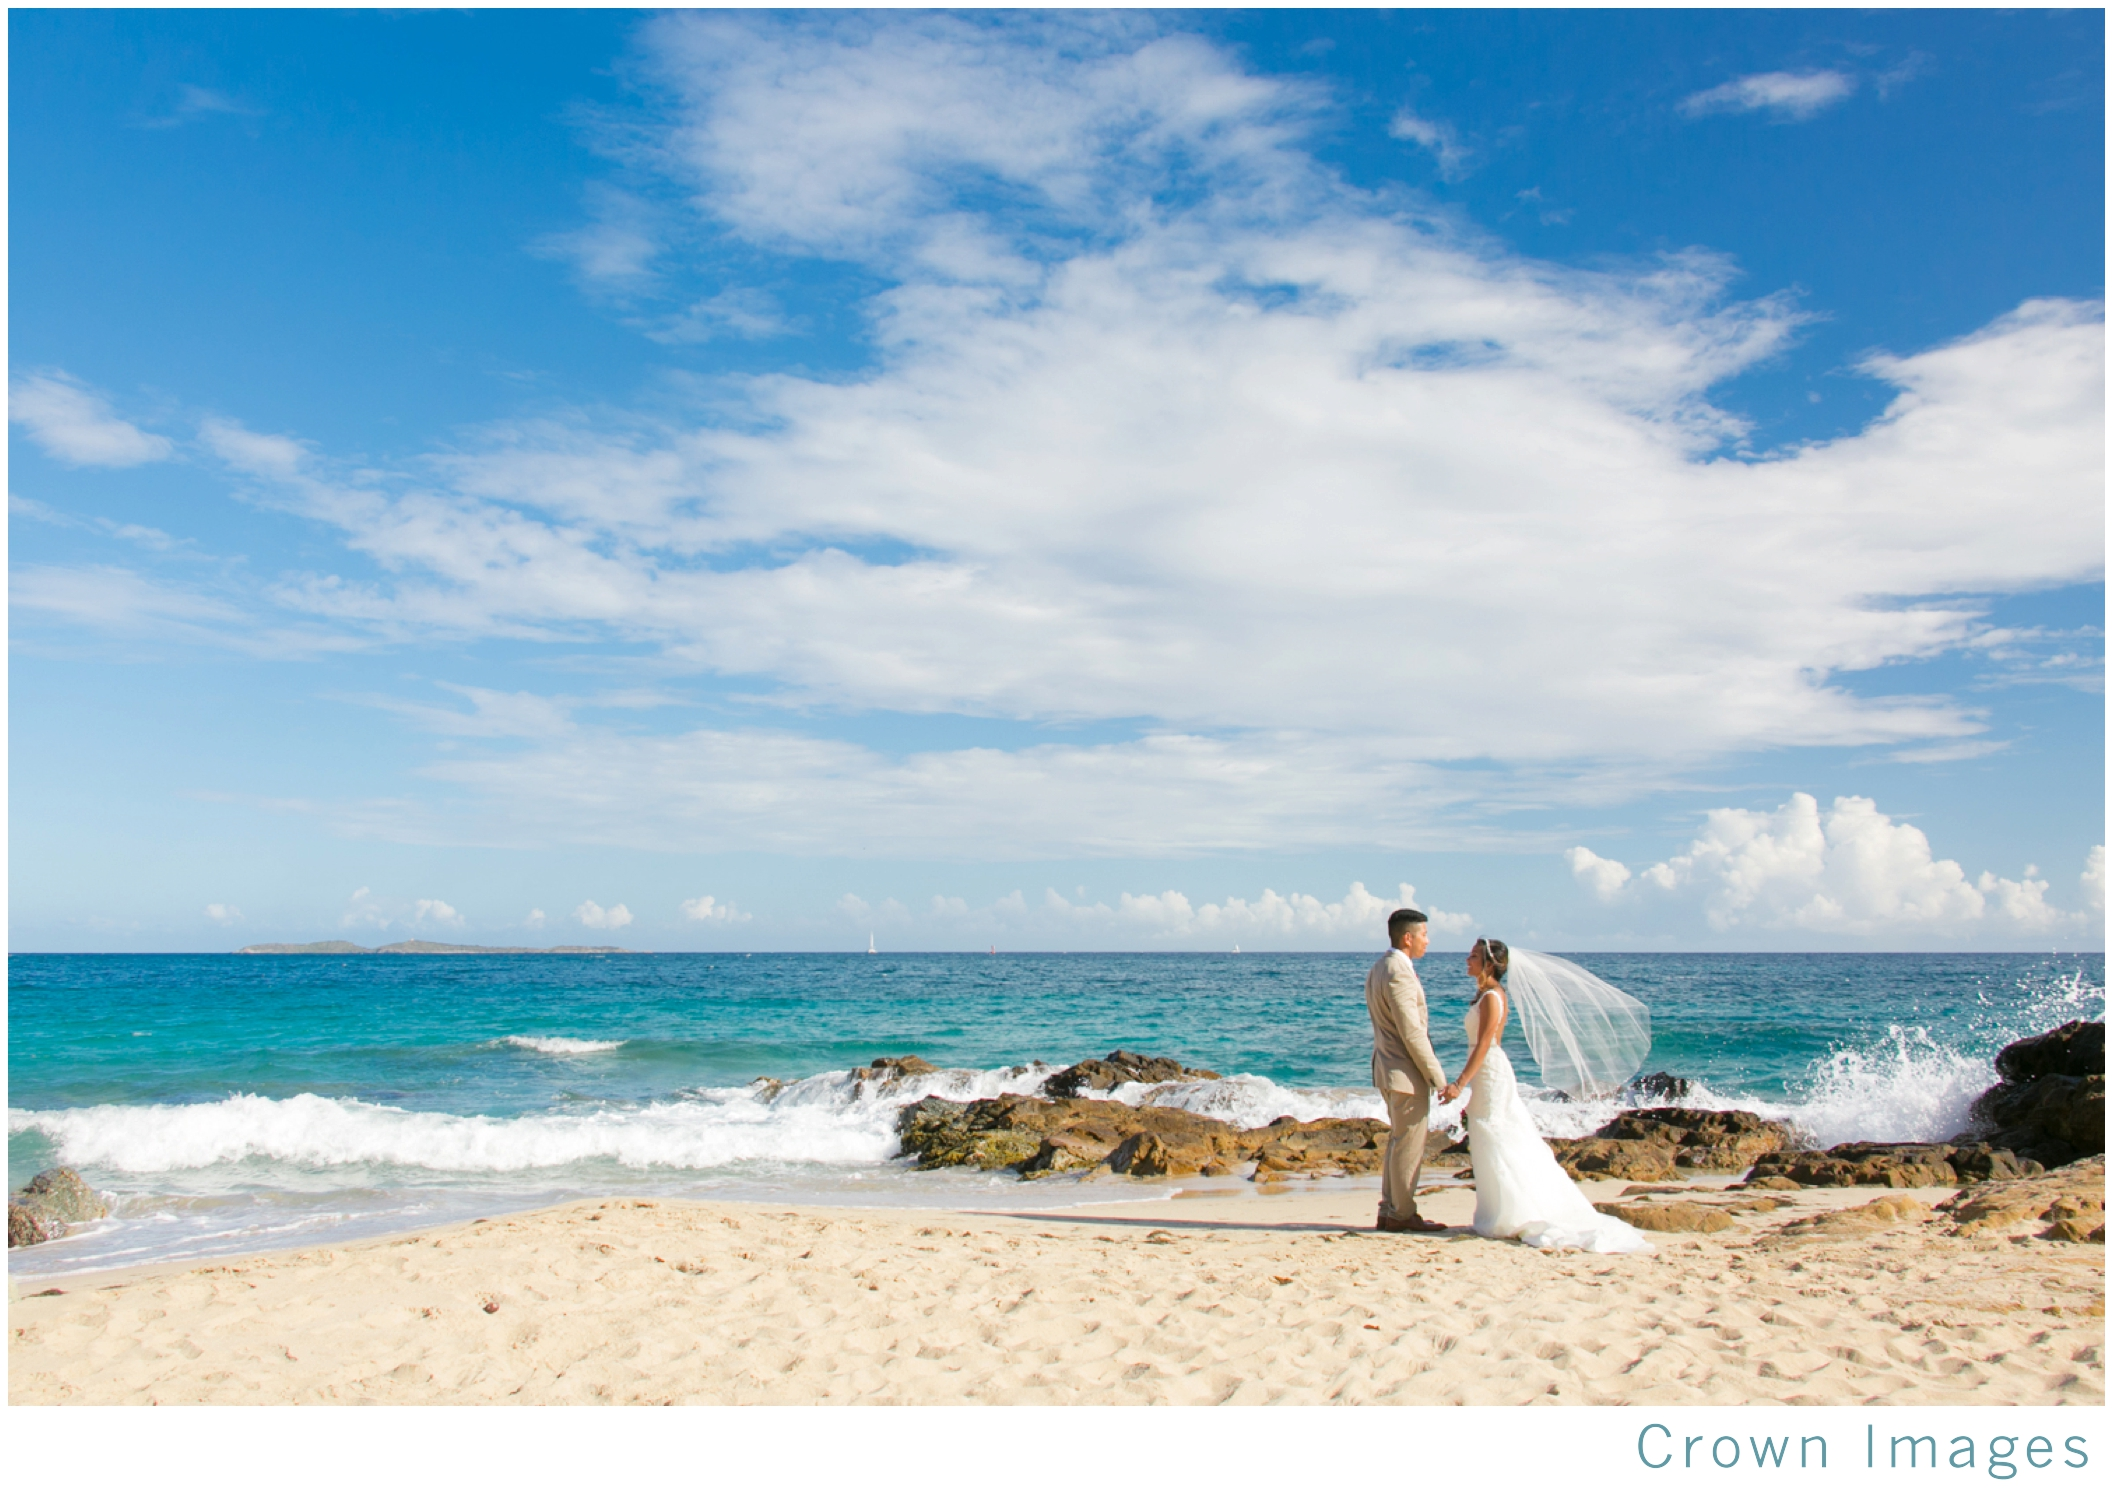 wedding-photos-st-thomas-marriott-frenchmans-reef_1820.jpg